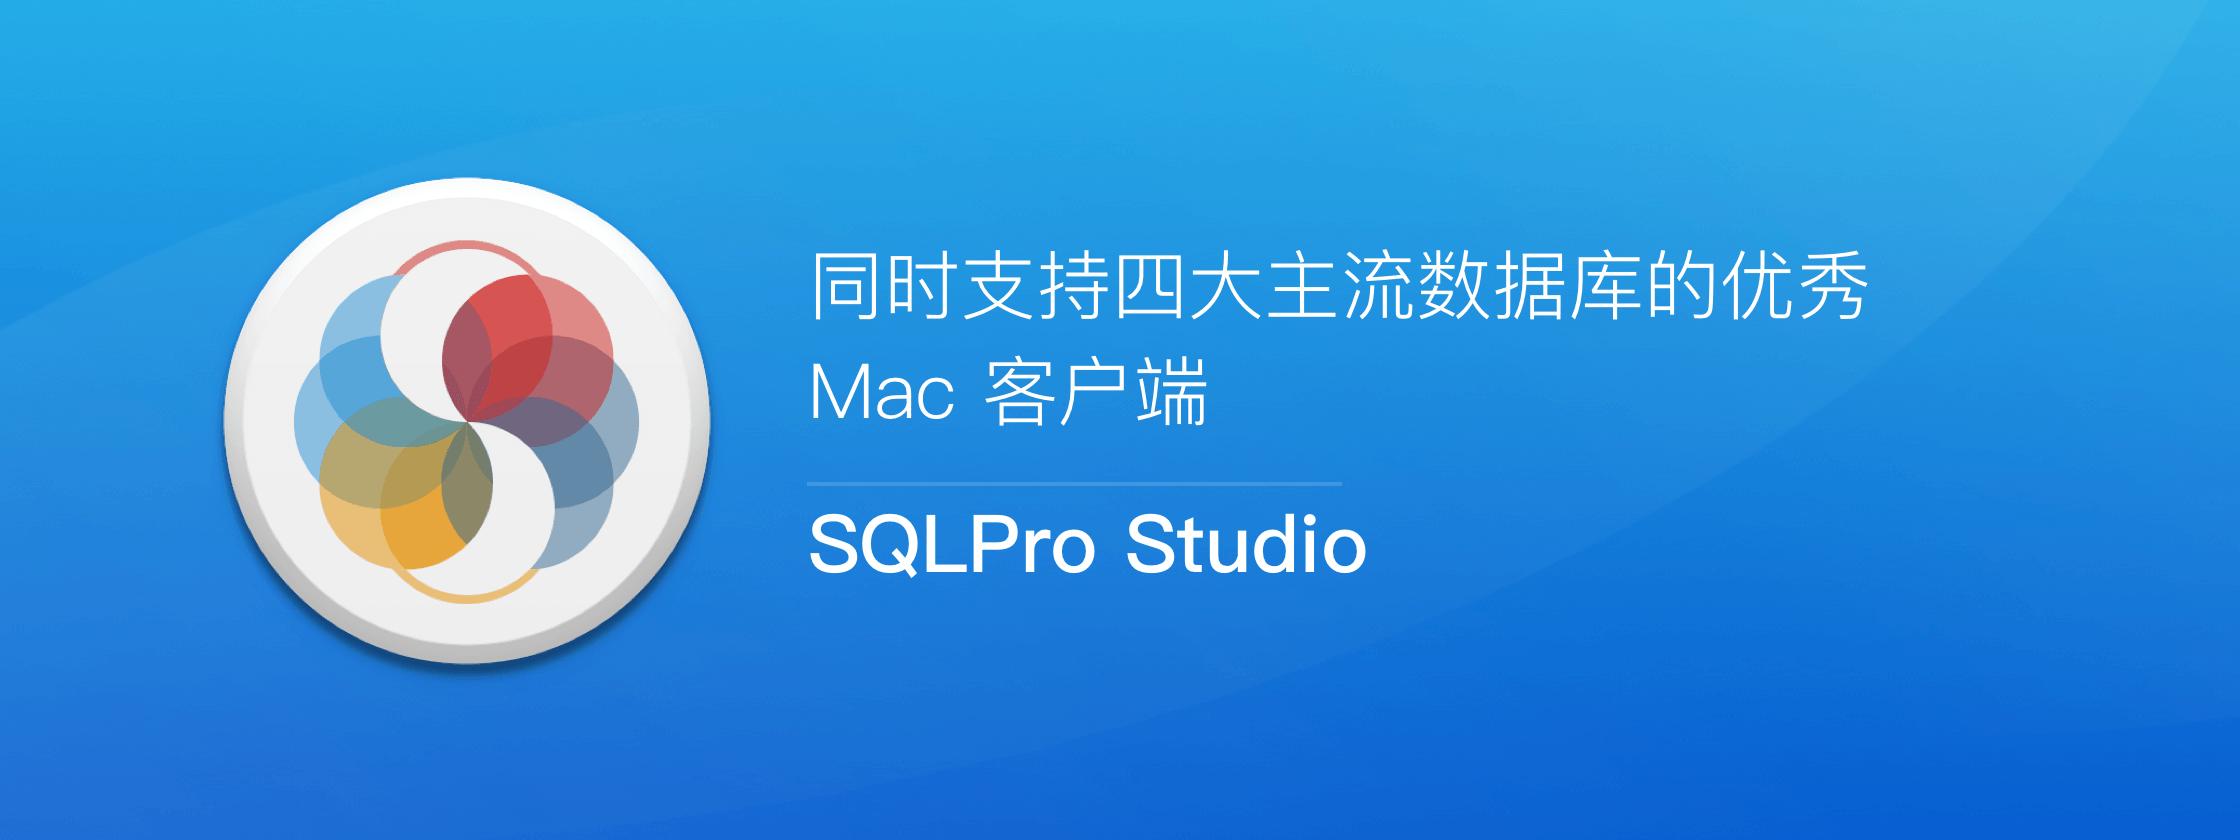 SQLPro Studio – 同时支持四大主流数据库的优秀 Mac 客户端